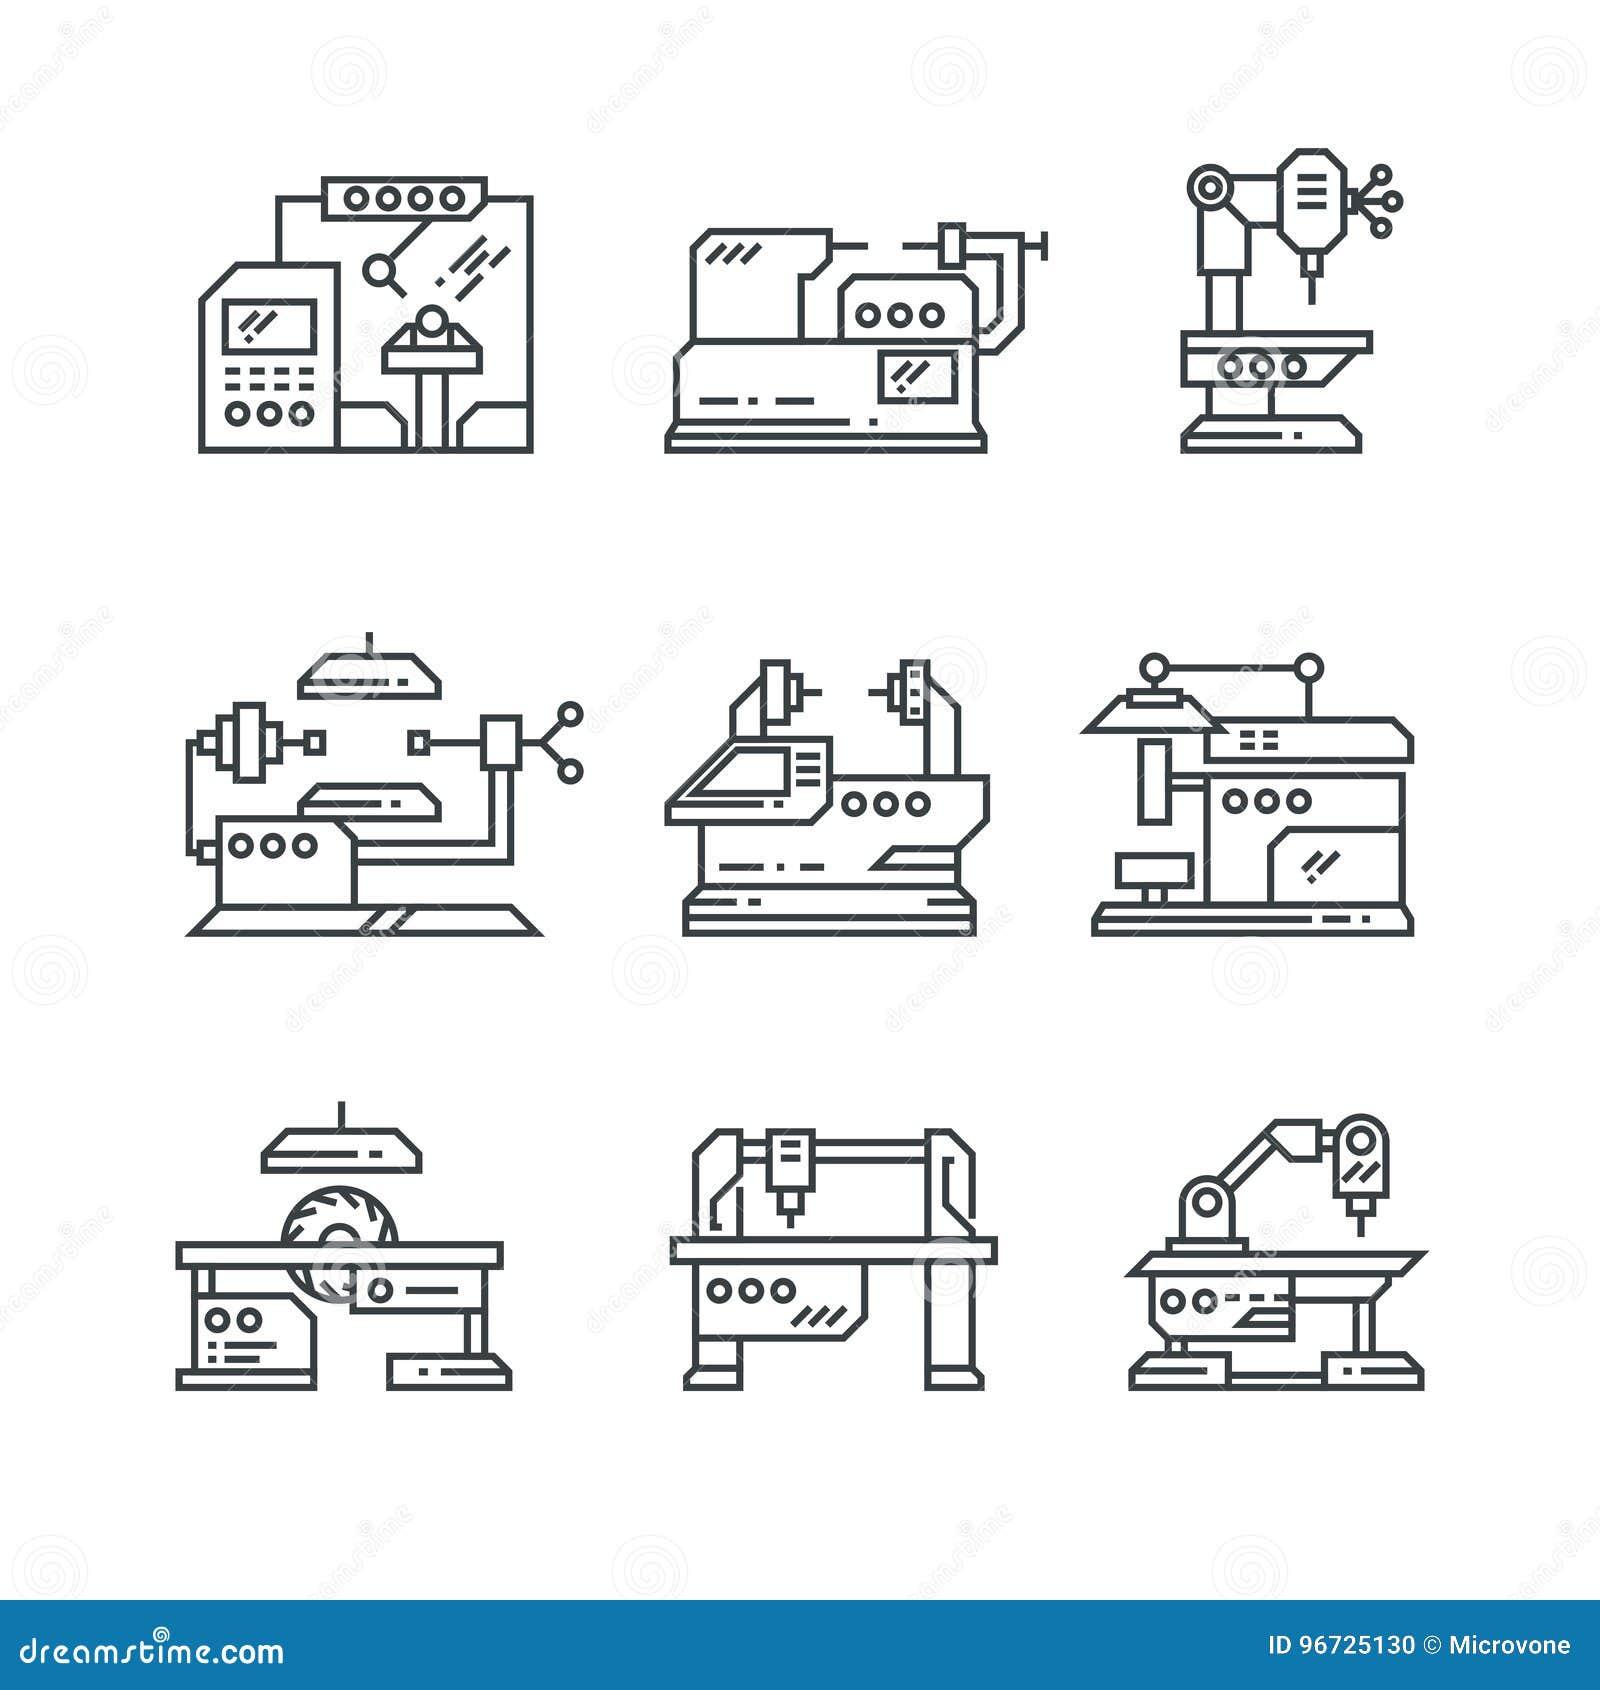 industrial symbols warehouse drawings jabra bt125